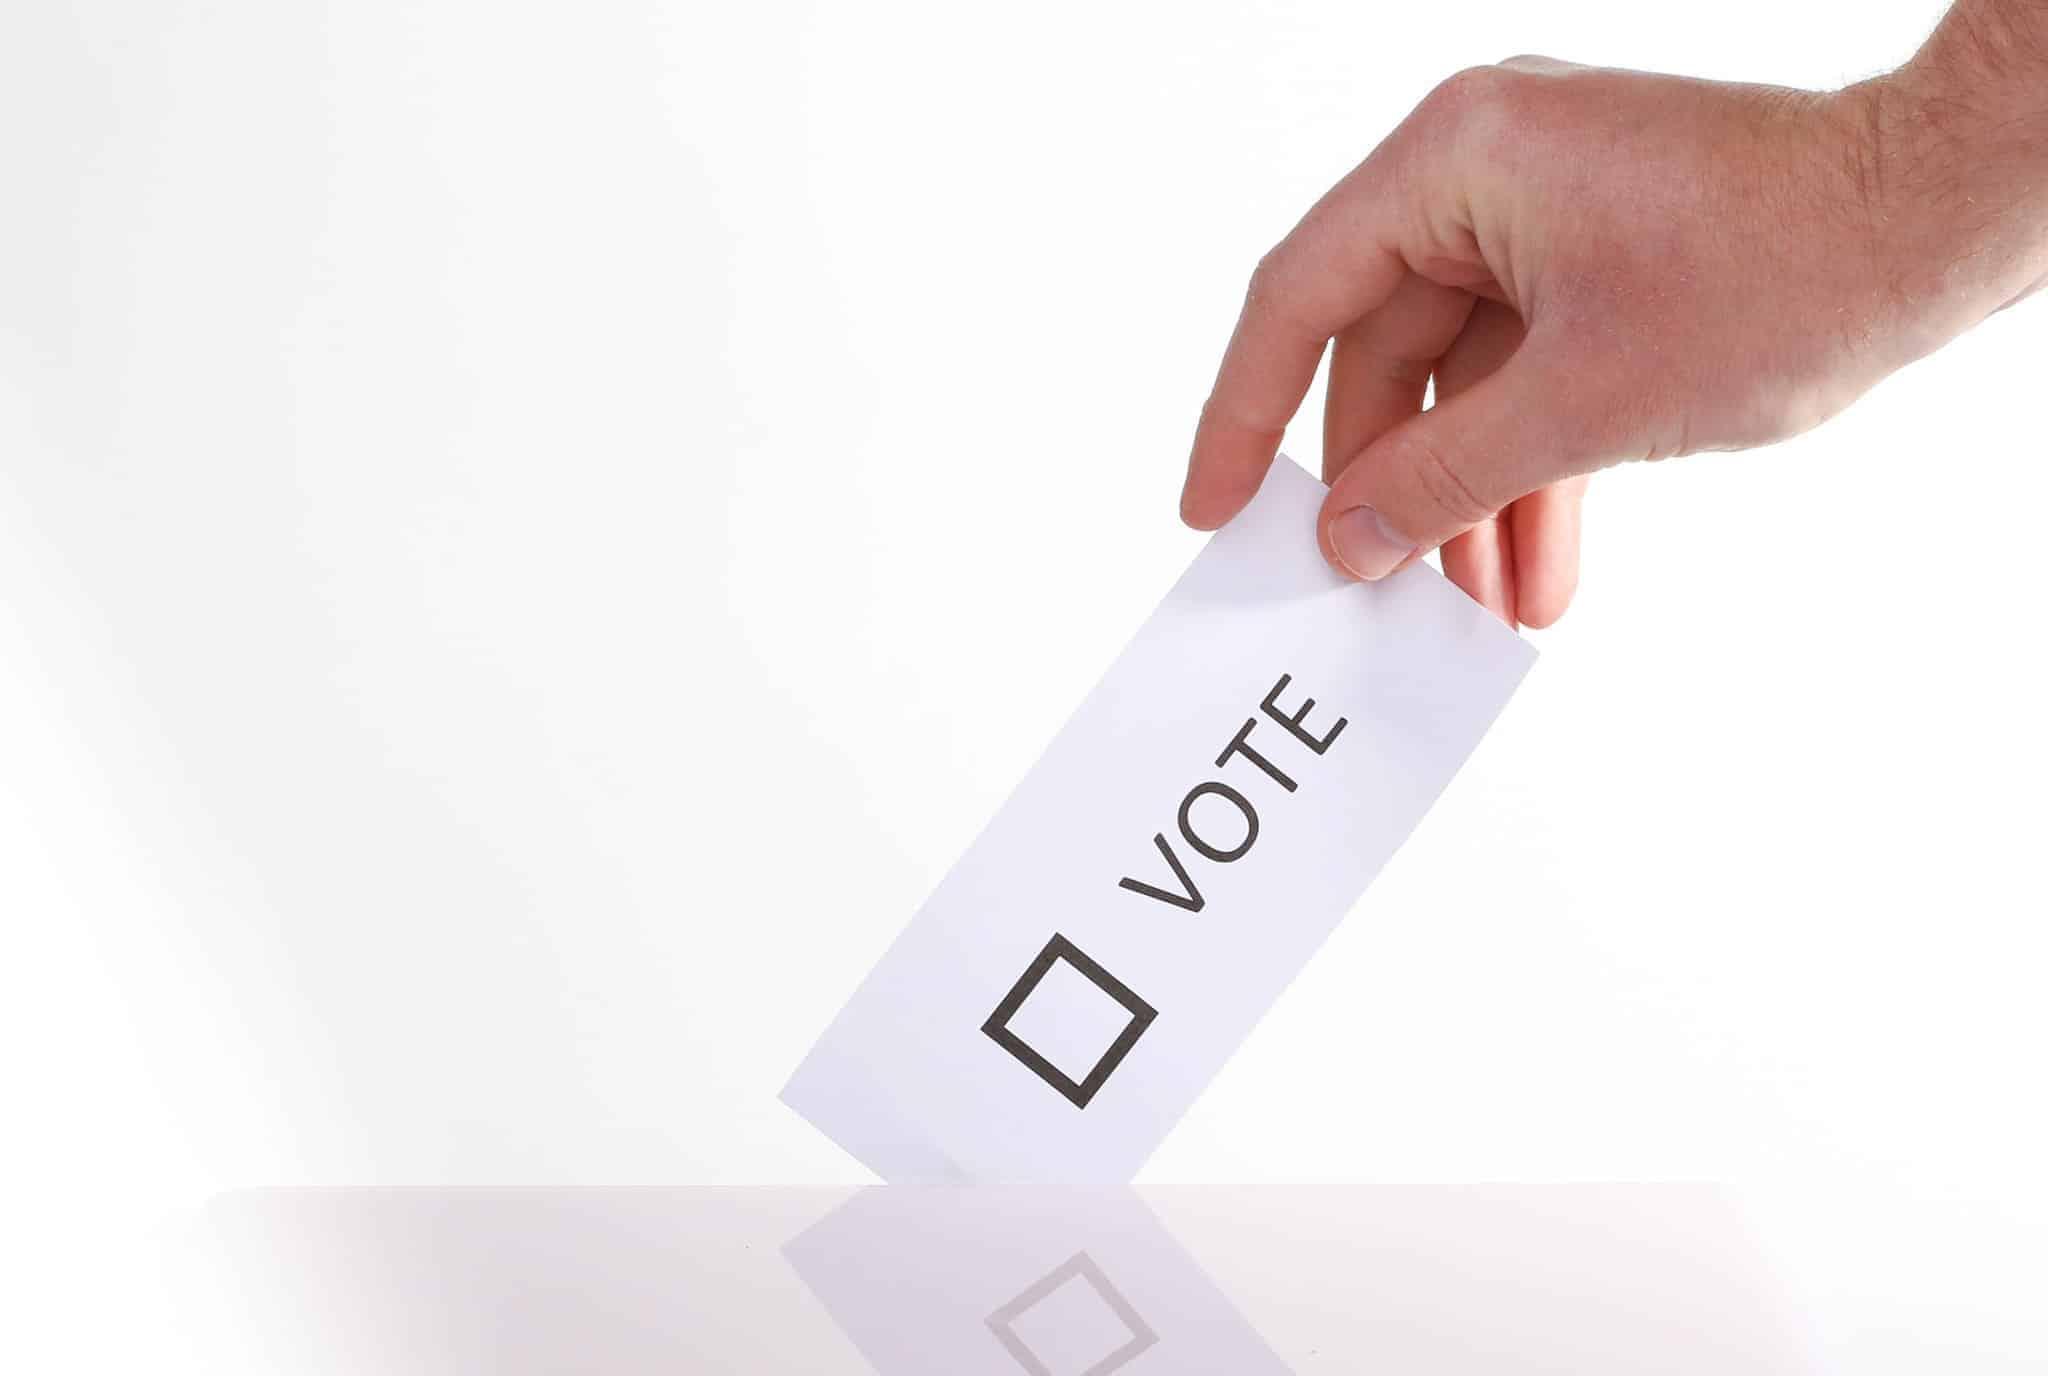 Voting Marco Verch CC BY 2.0